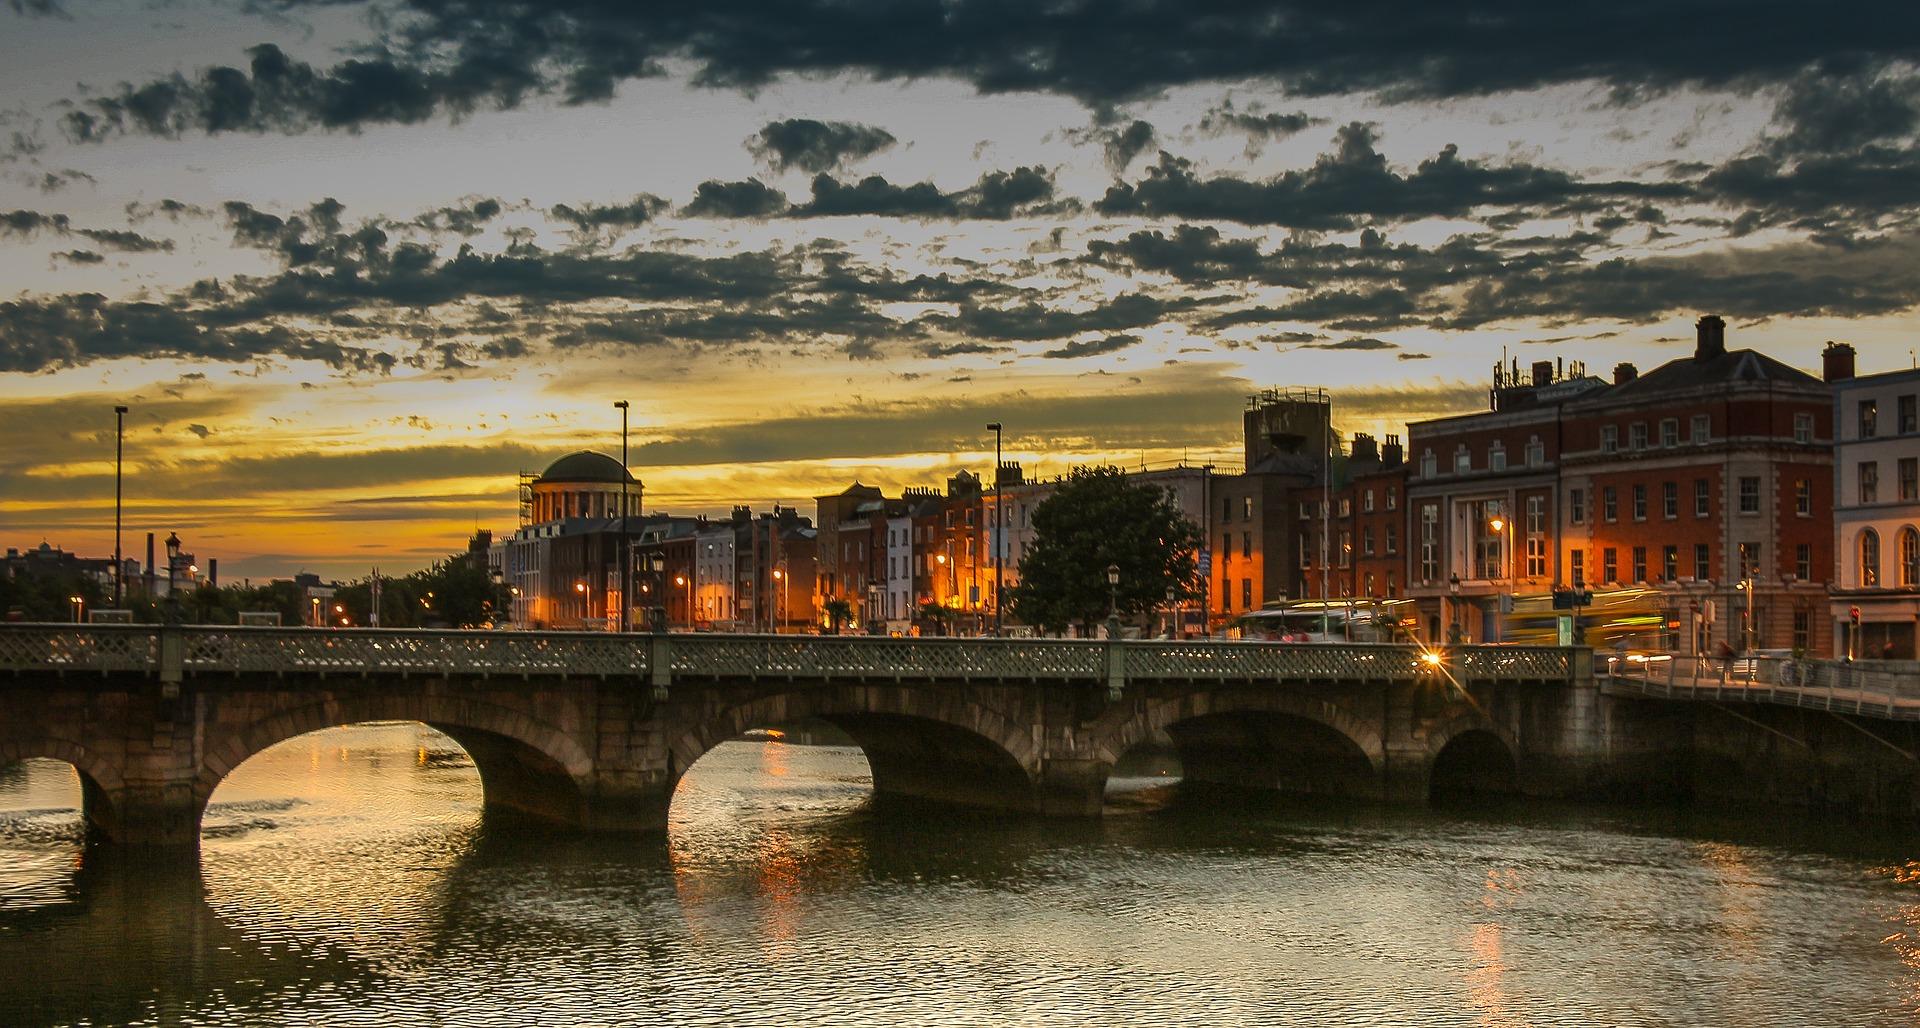 motivos-para-estudar-na-irlanda-dublin